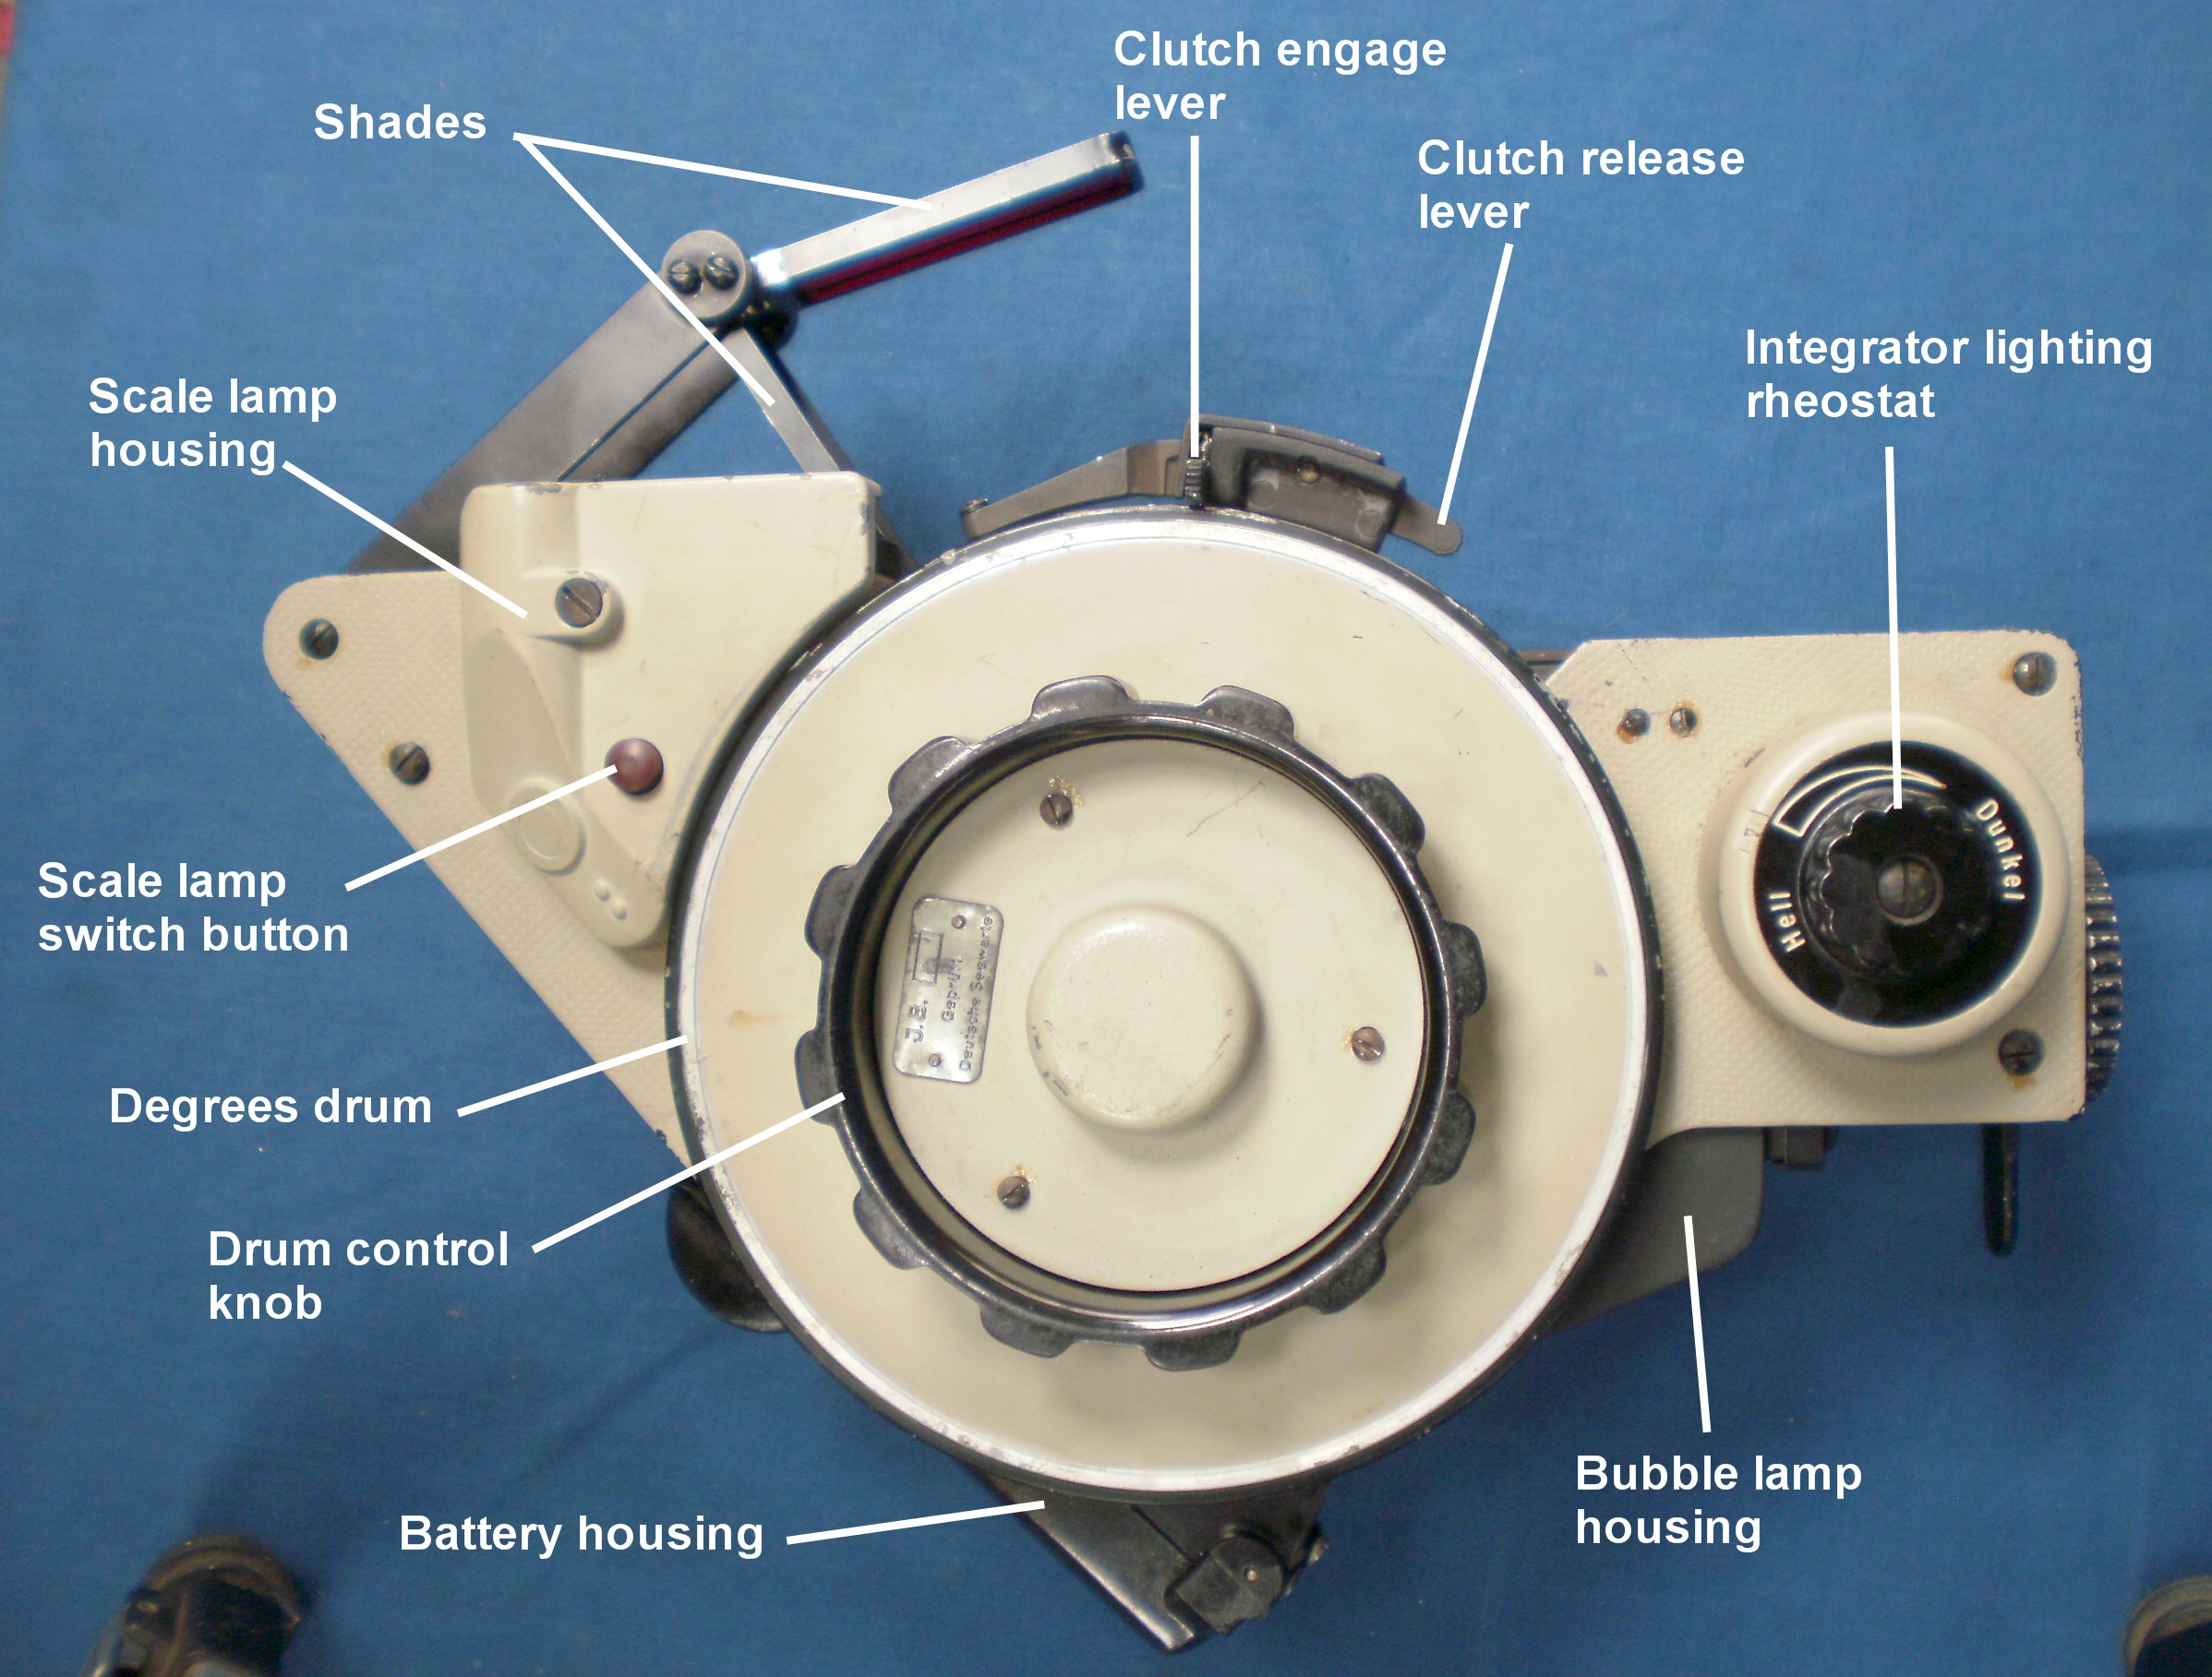 Figure 3: General arrangement, right side.